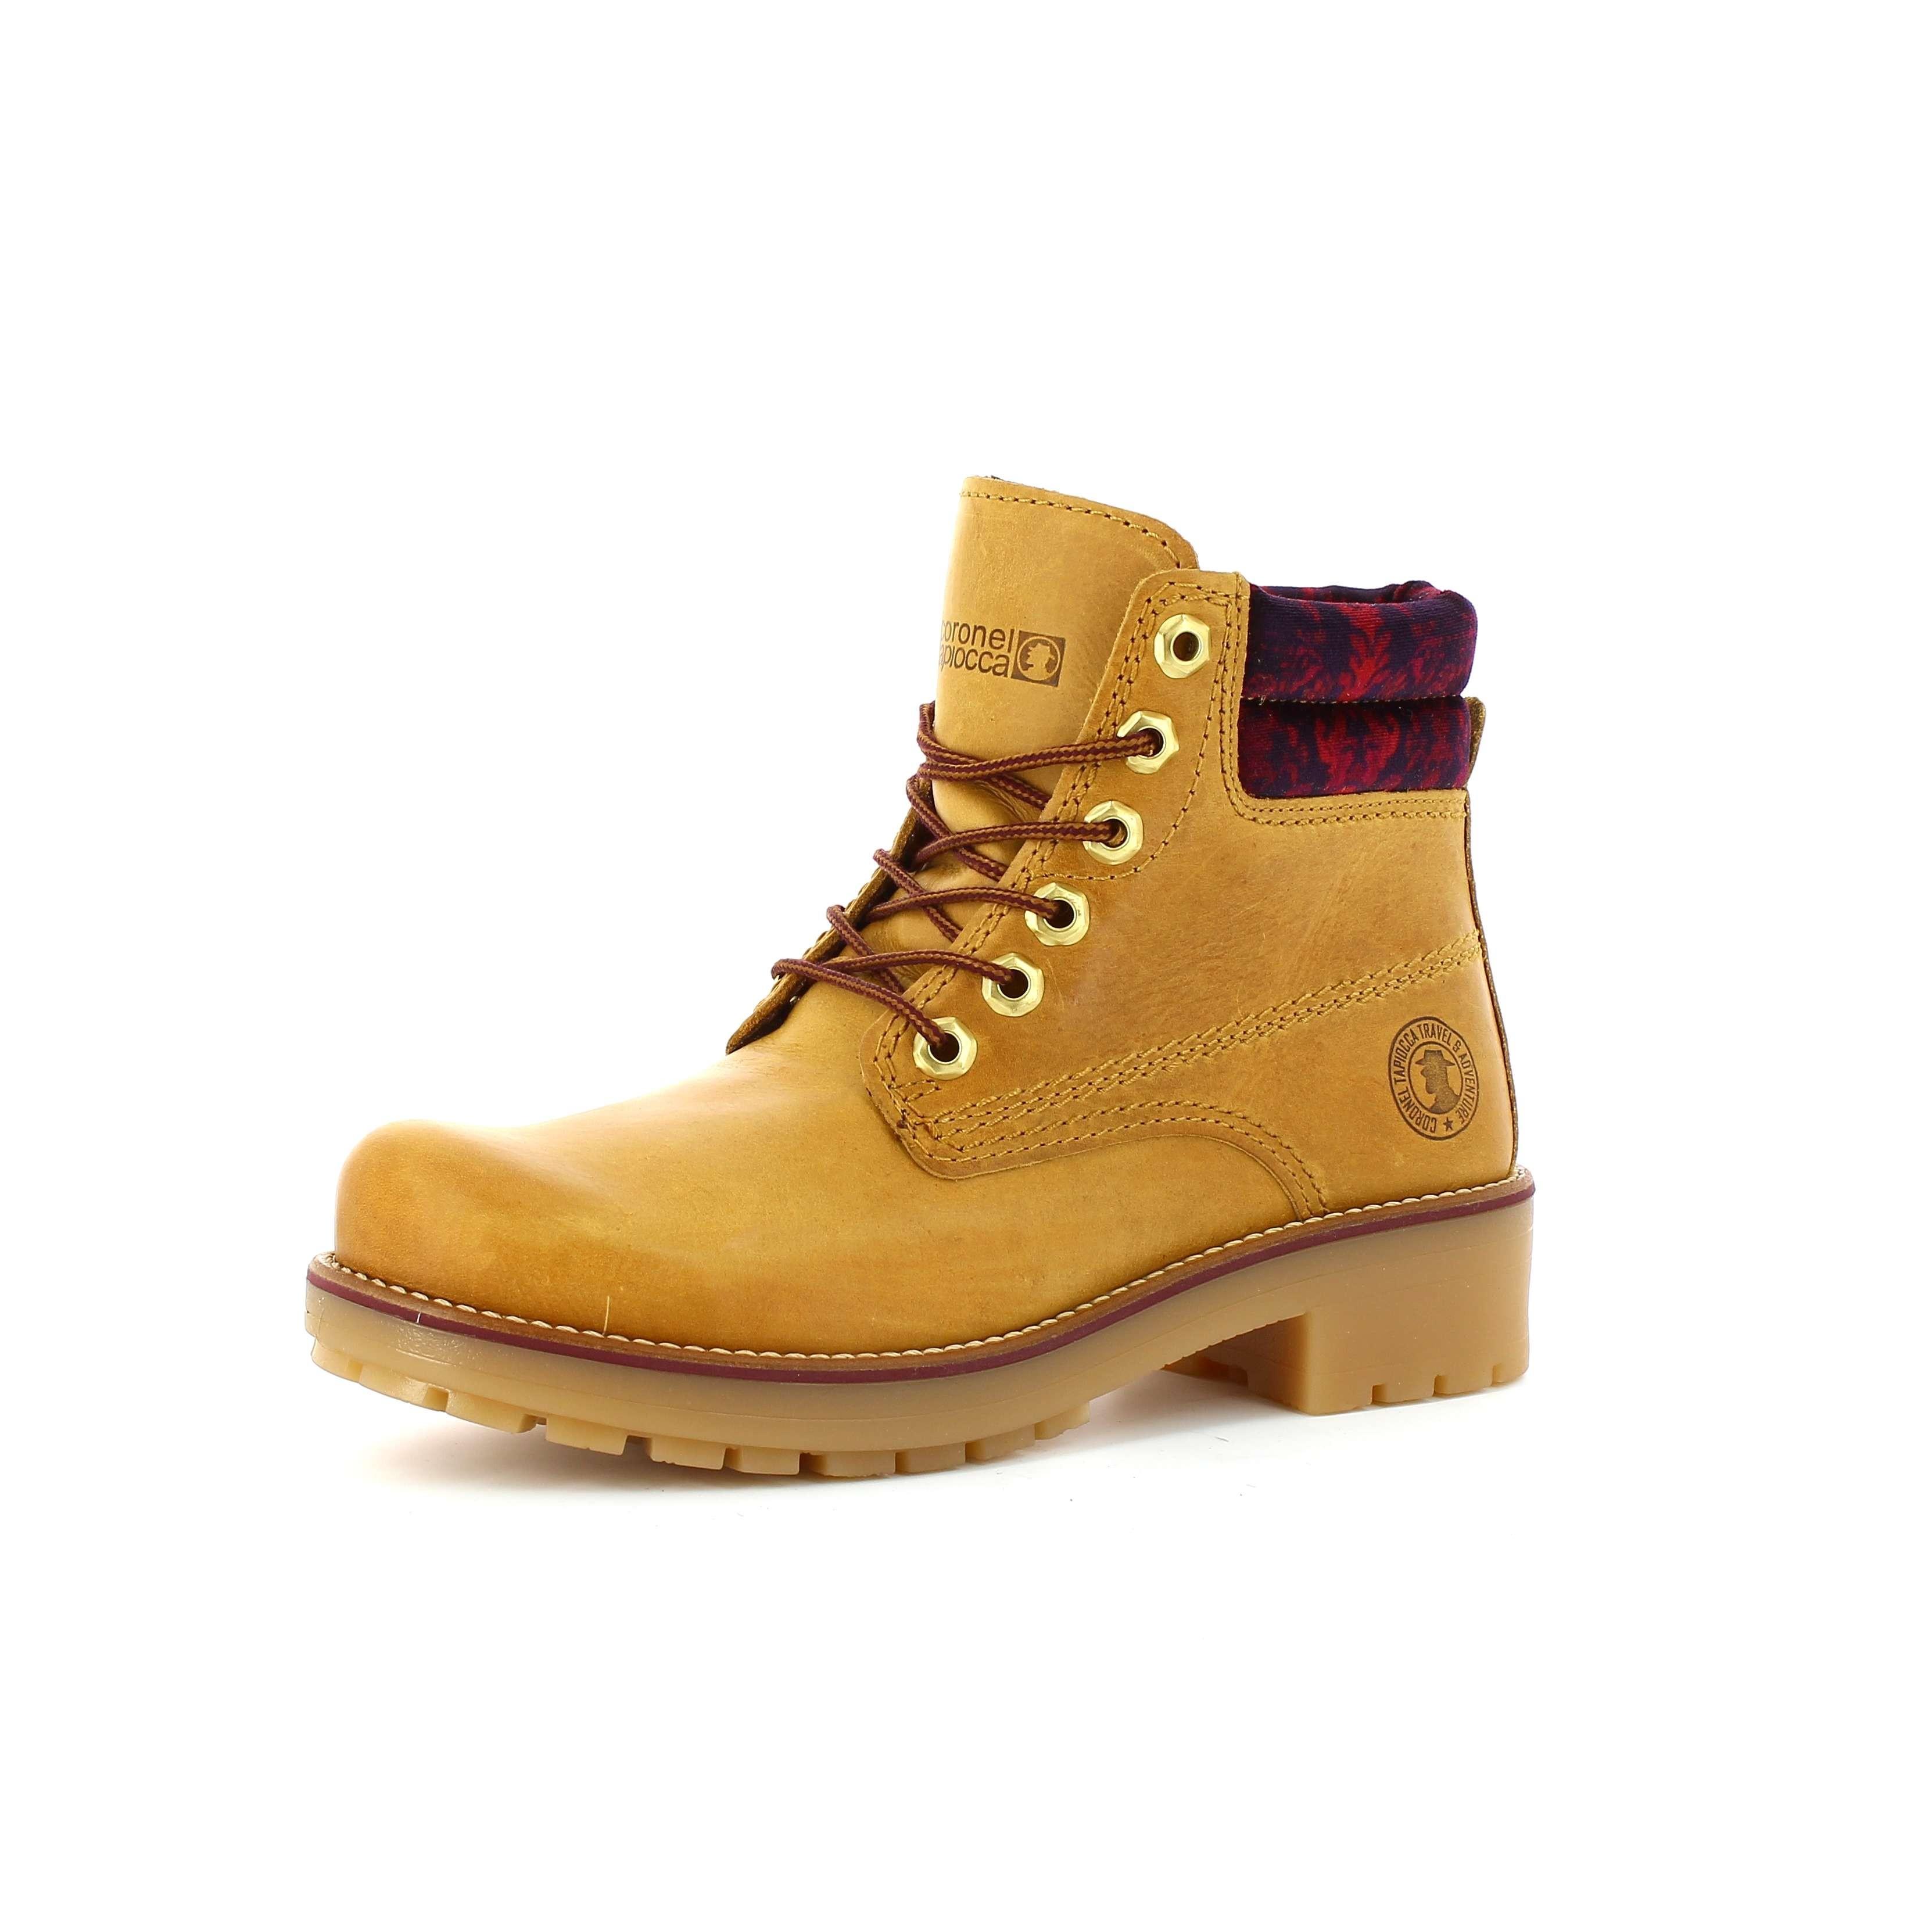 Zapatos Voltagee Coronel Tapiocca Bota Mujer Mostaza Online YwxESOIqO